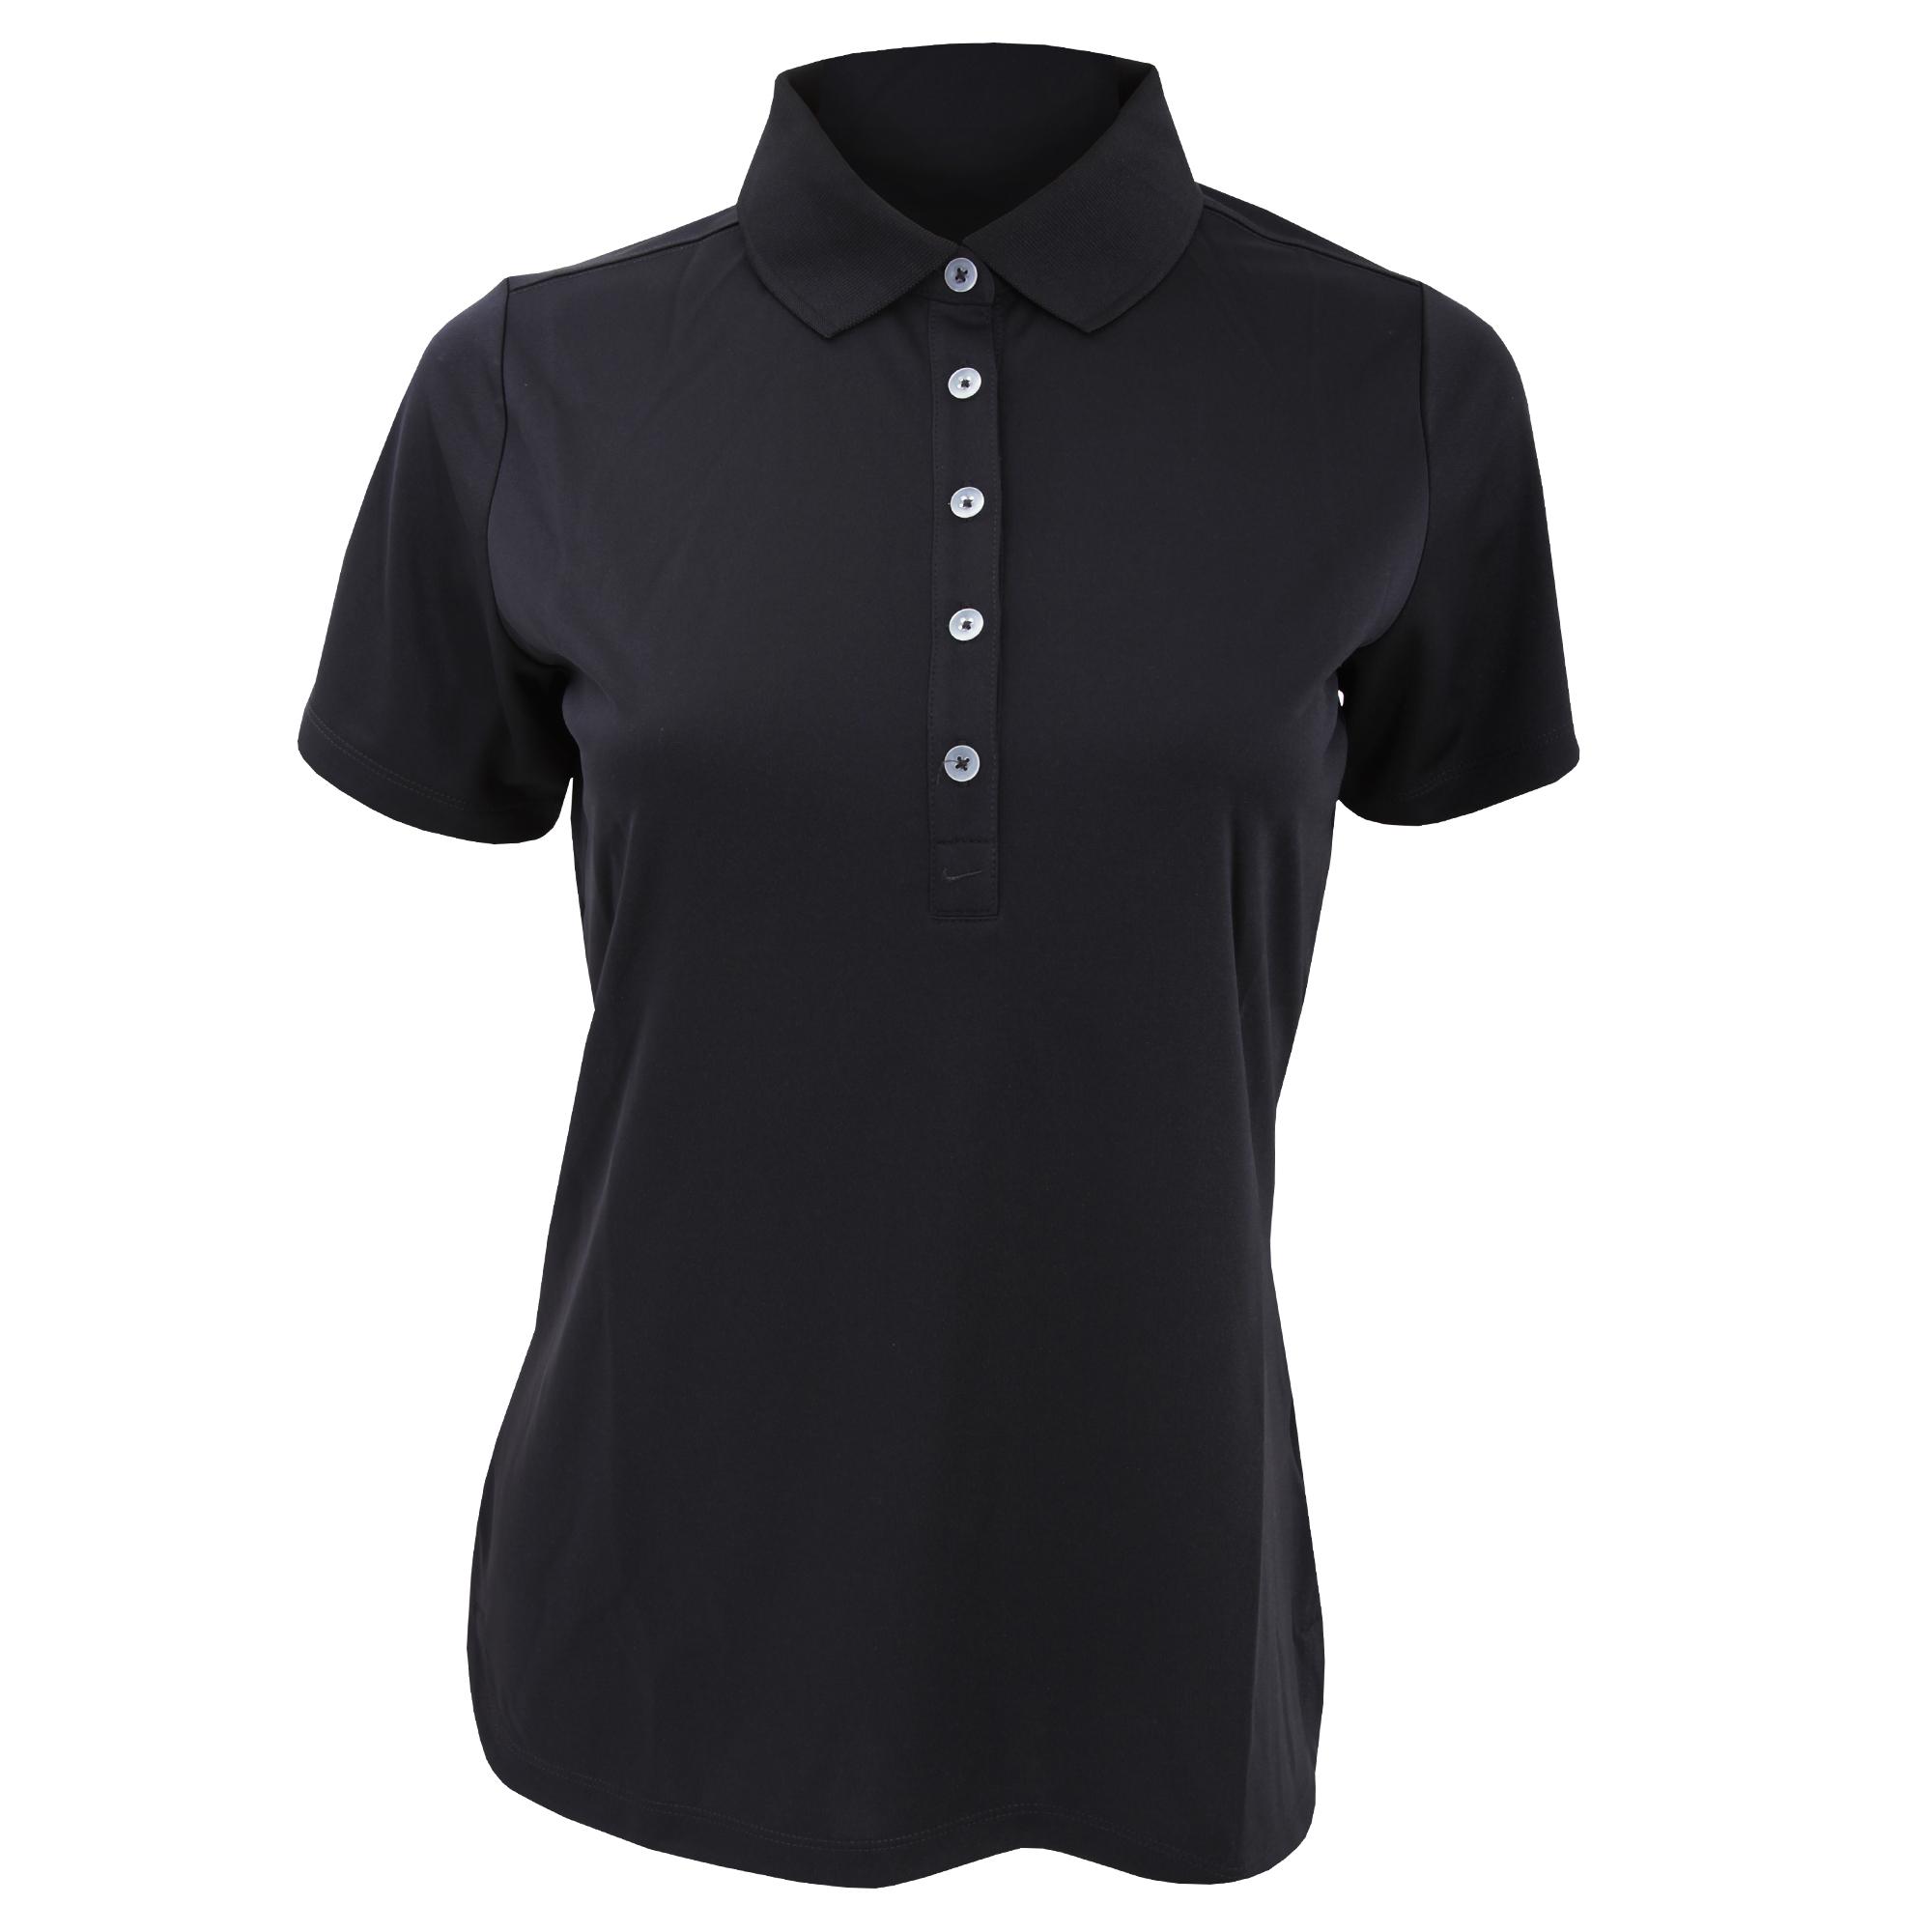 Nike Golf Ladies Victory Sports Polo Shirt / Golfwear | eBay